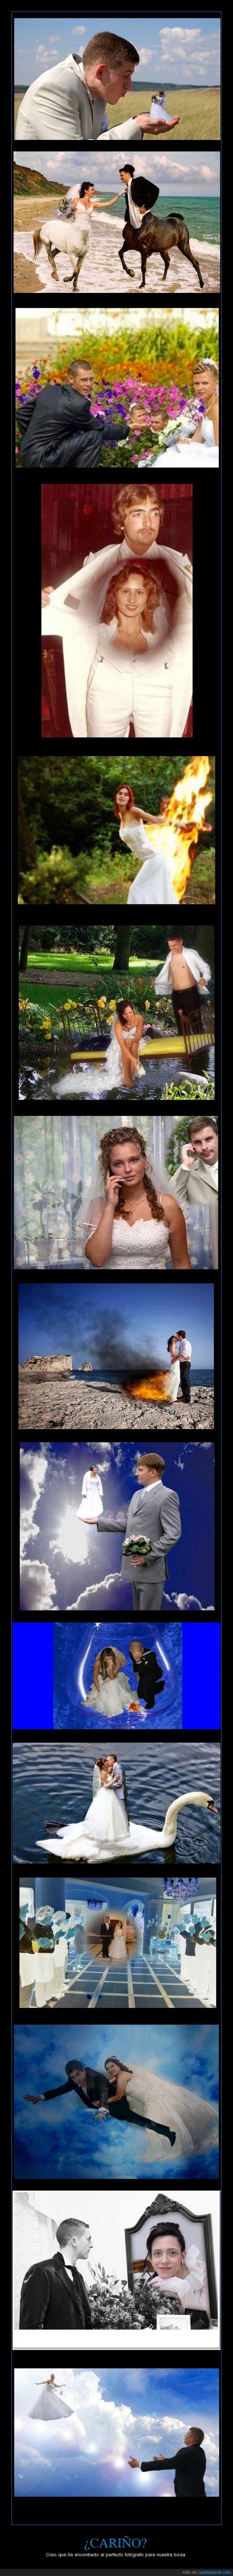 boda,montajes,novios,photoshop del malo,reportaje de boda,terrible